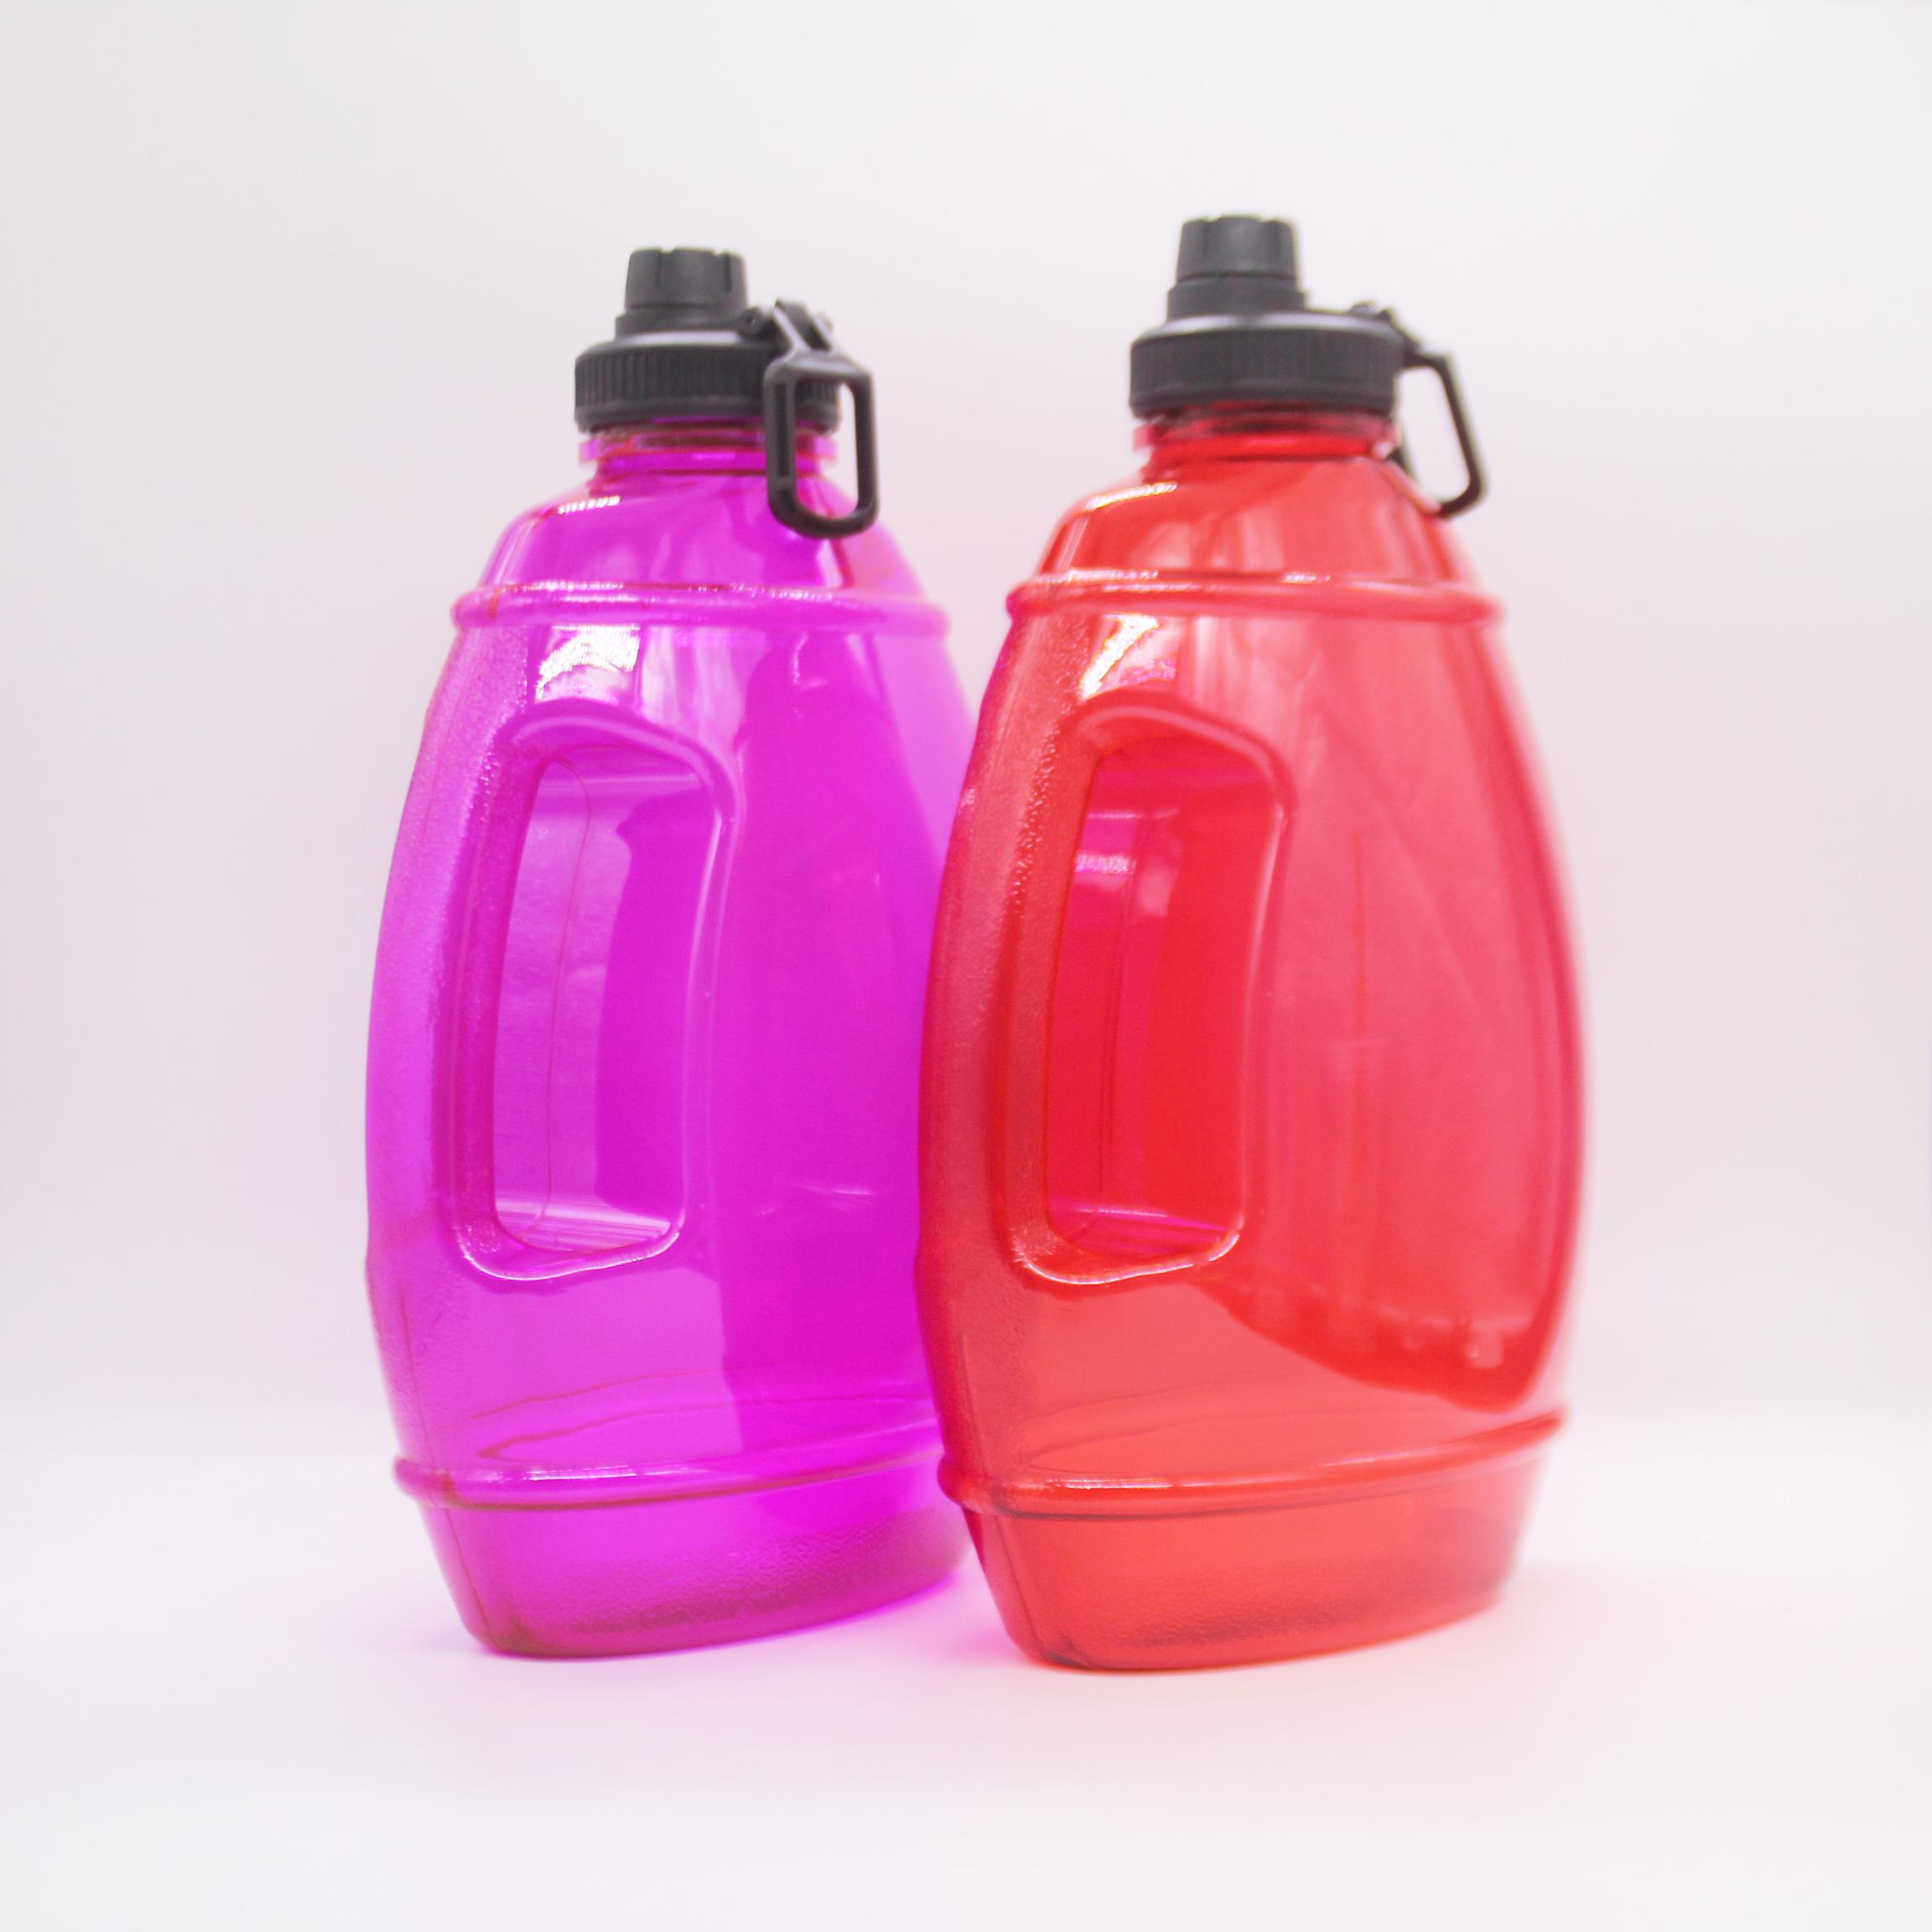 BPA Free Big Capacity Gallon Plastic Water Jug with handle and lid